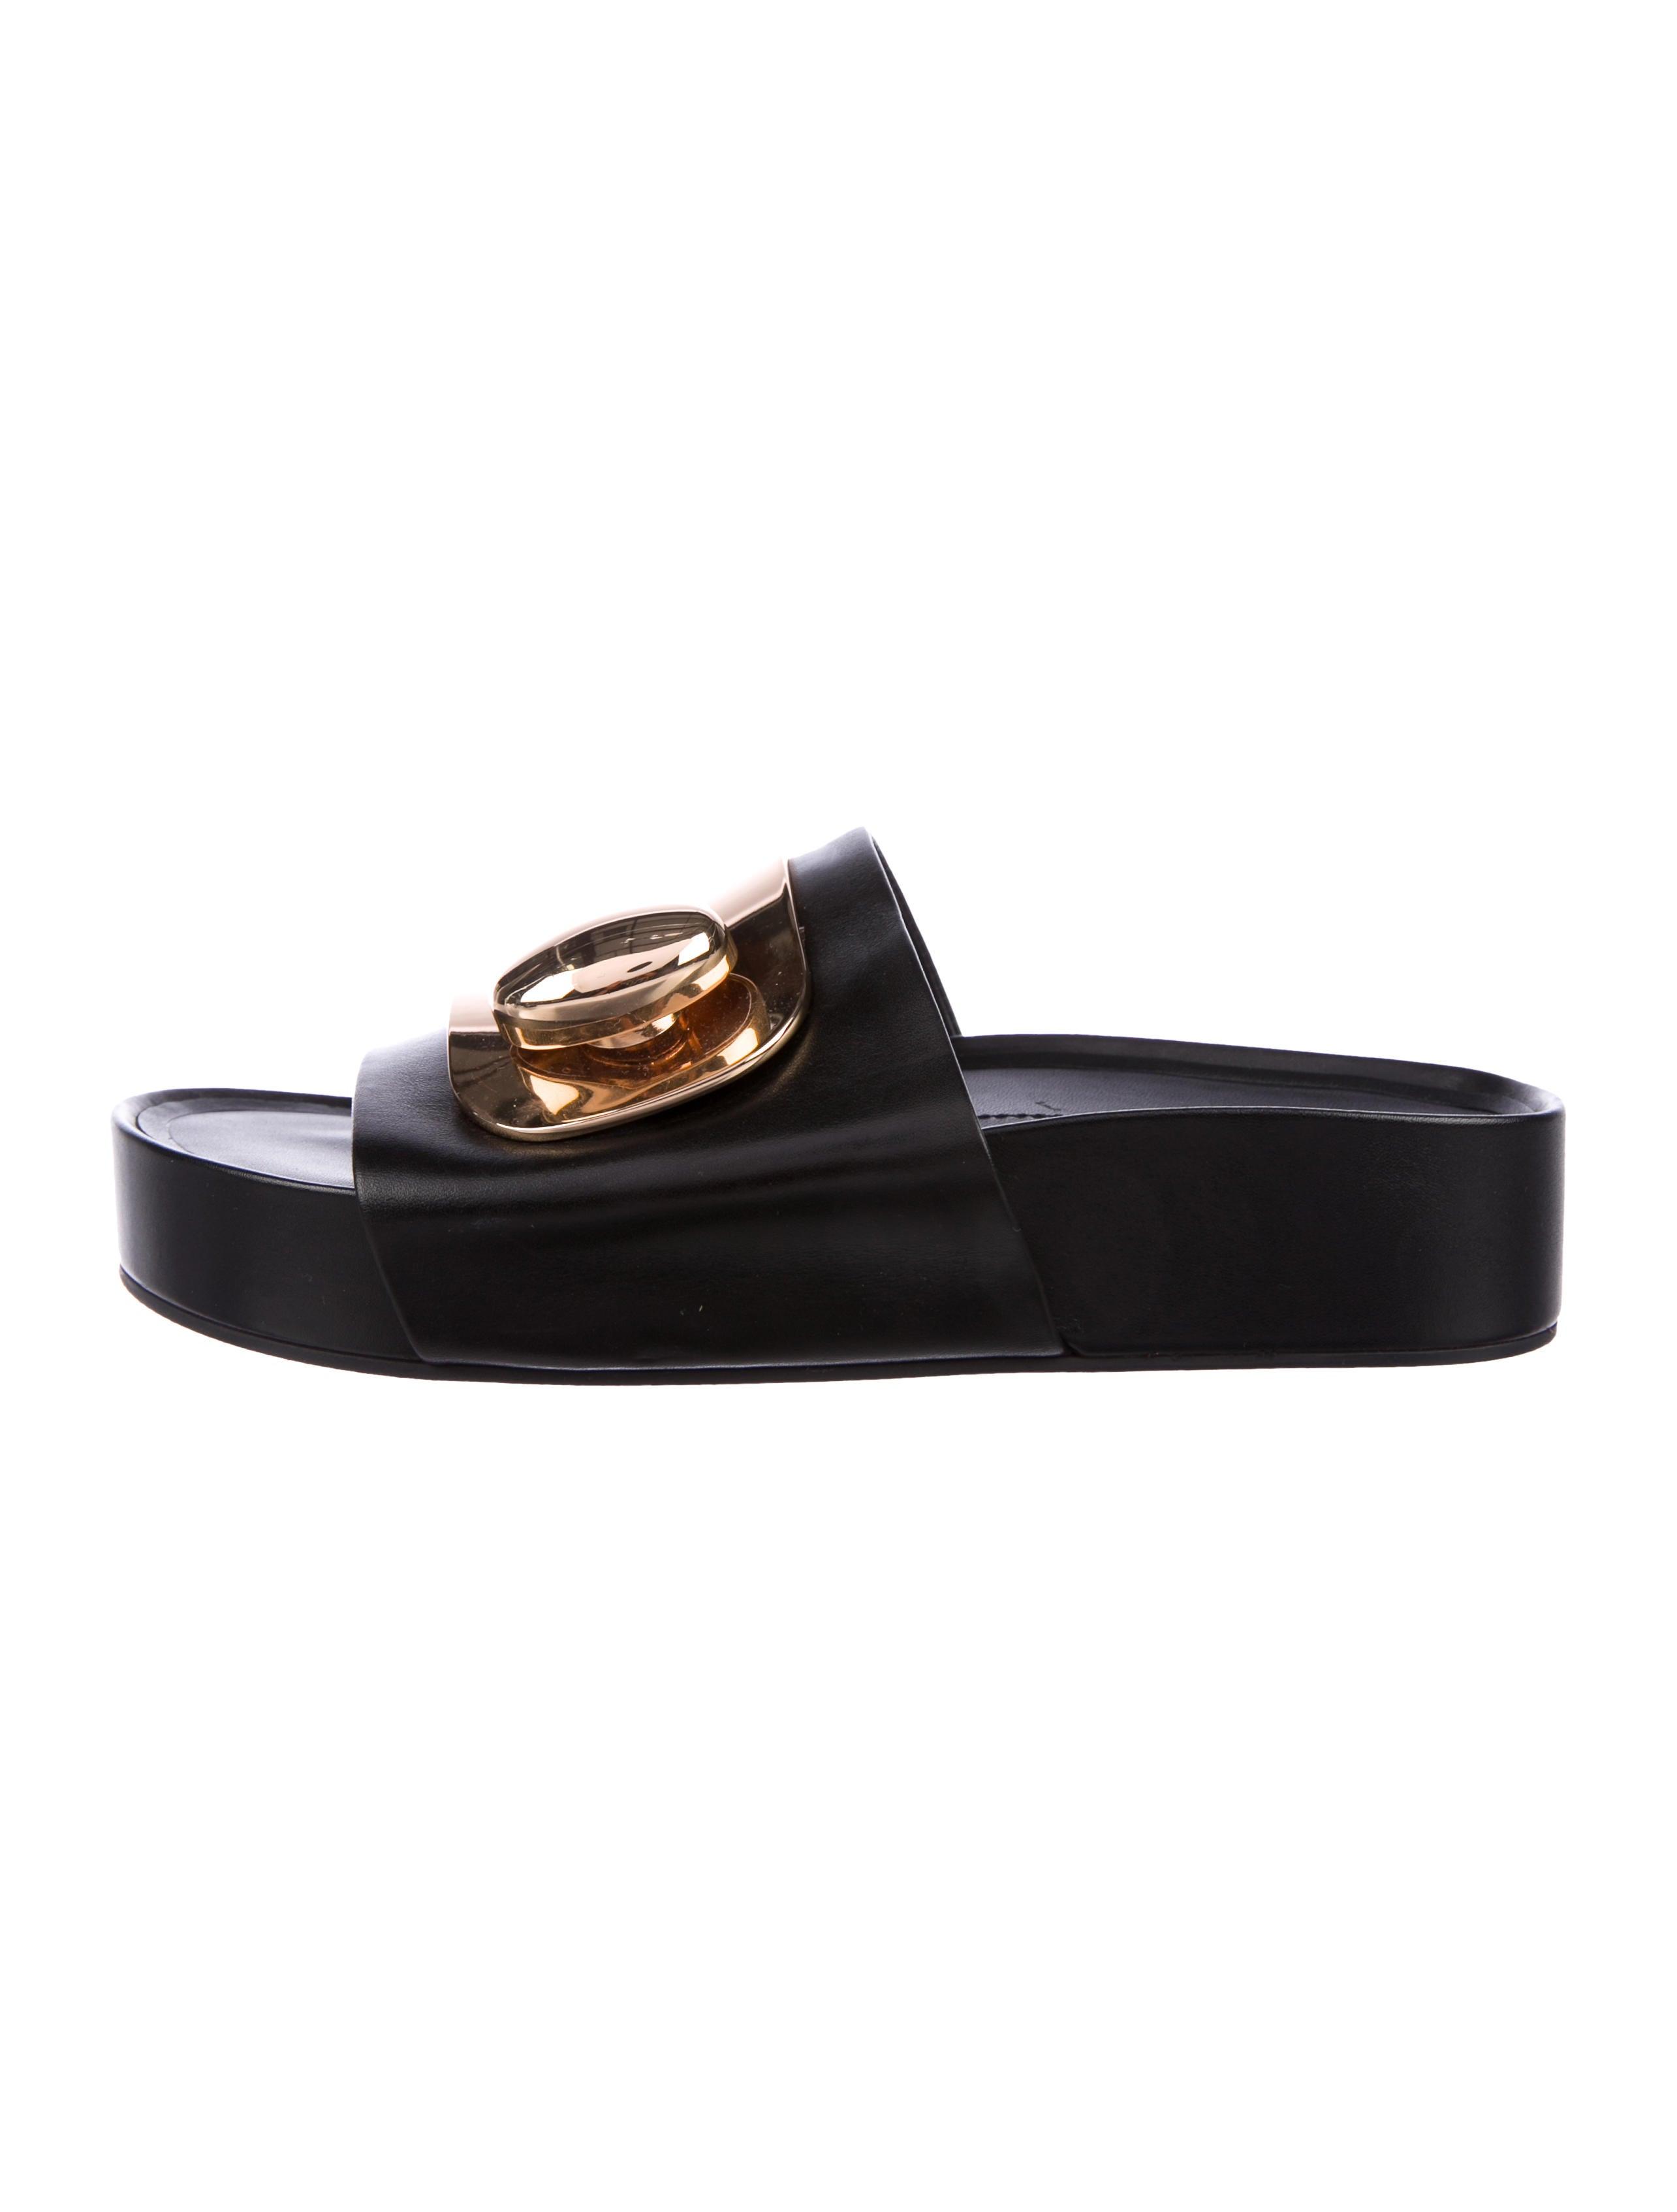 Stella Luna 2018 Leather Buckle Sandals order sale online x4FjOGb